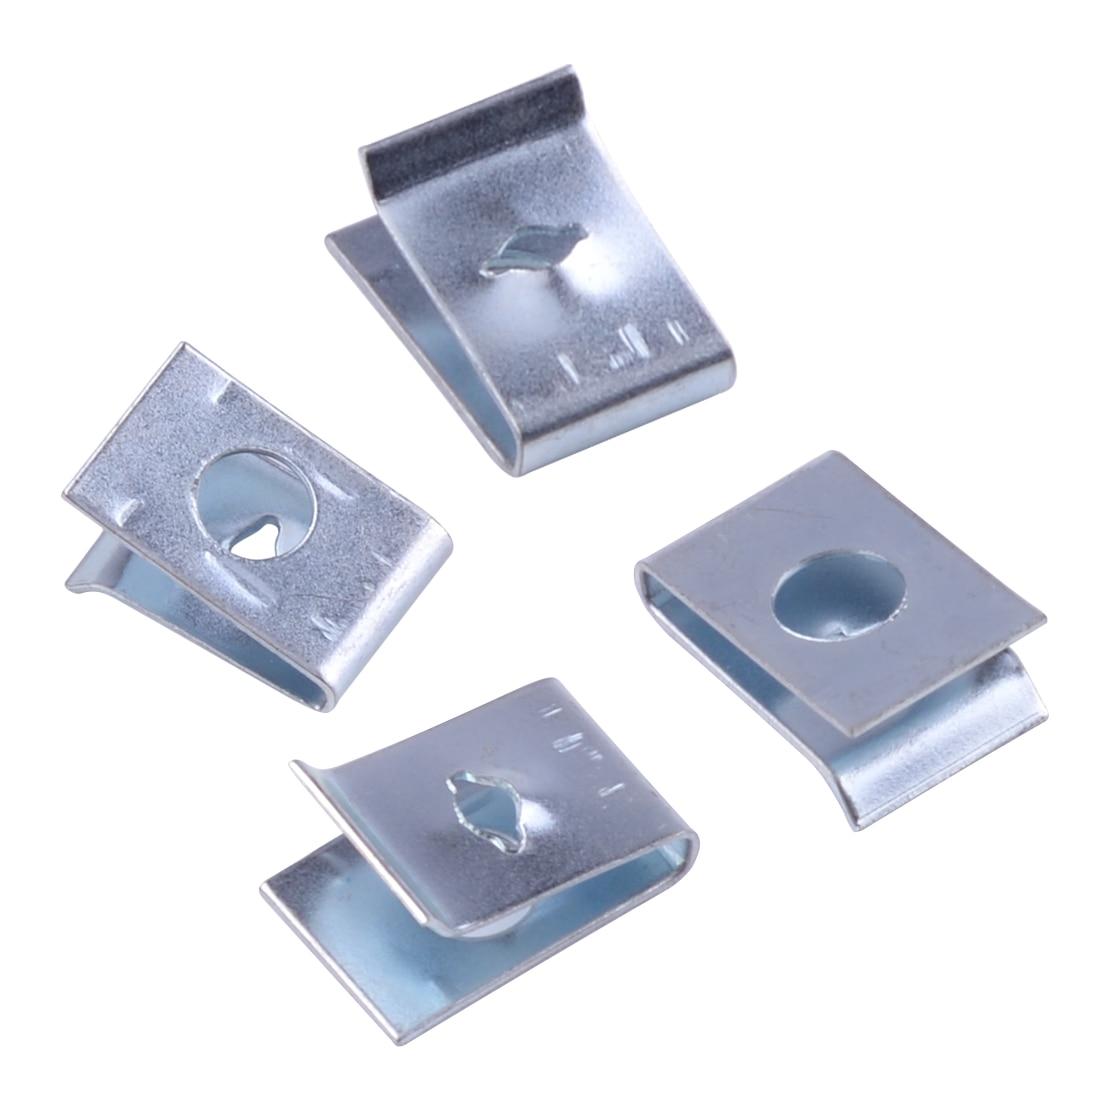 100 x Speed Fastener U Nuts Interior Trim Panel Self Tapping Screw Spire Clips No 14